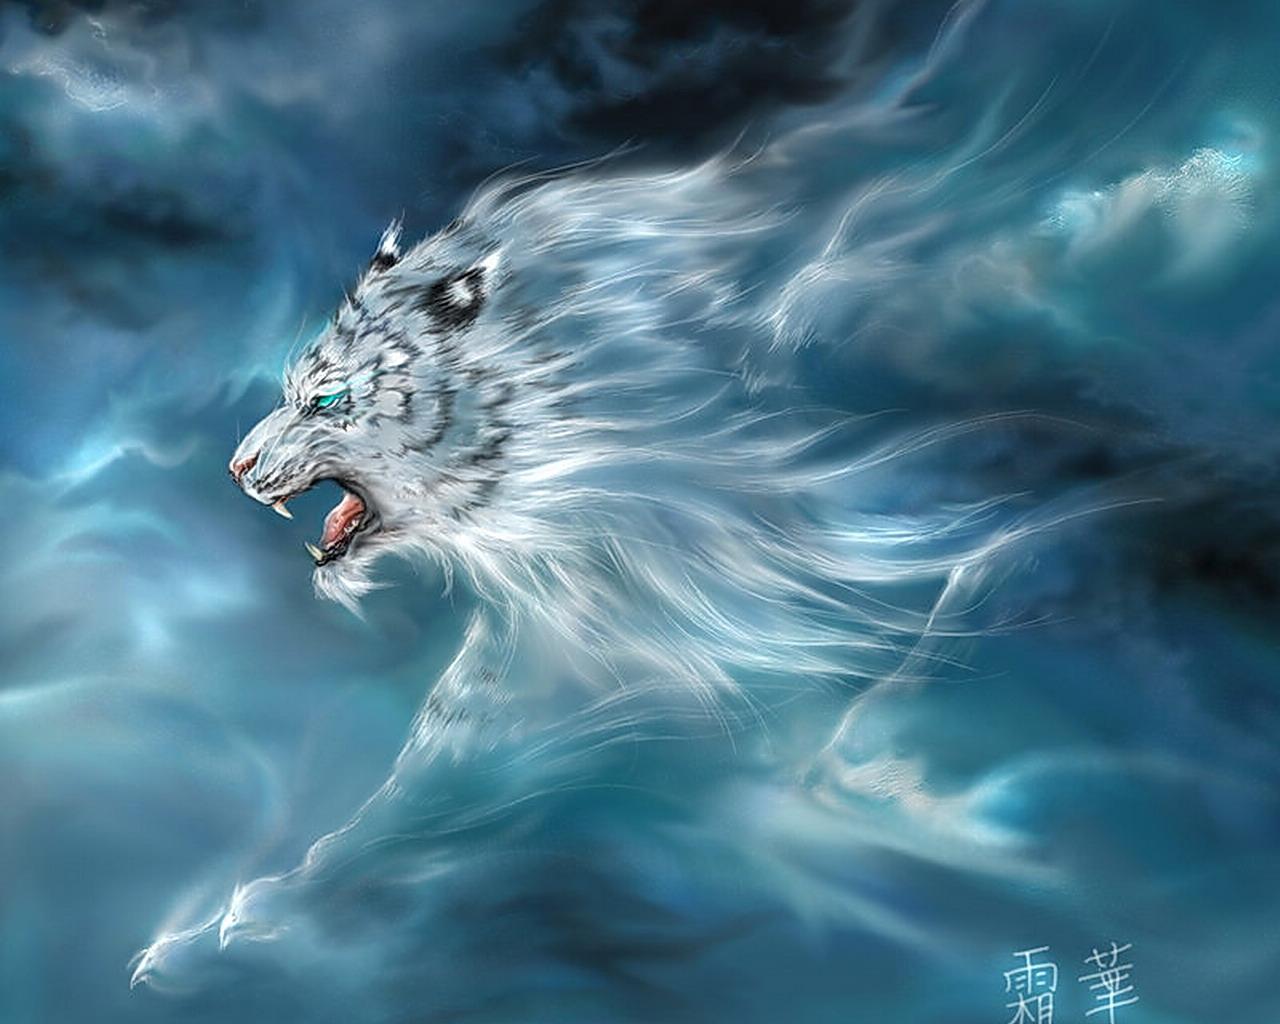 gambar harimau - gambar harimau